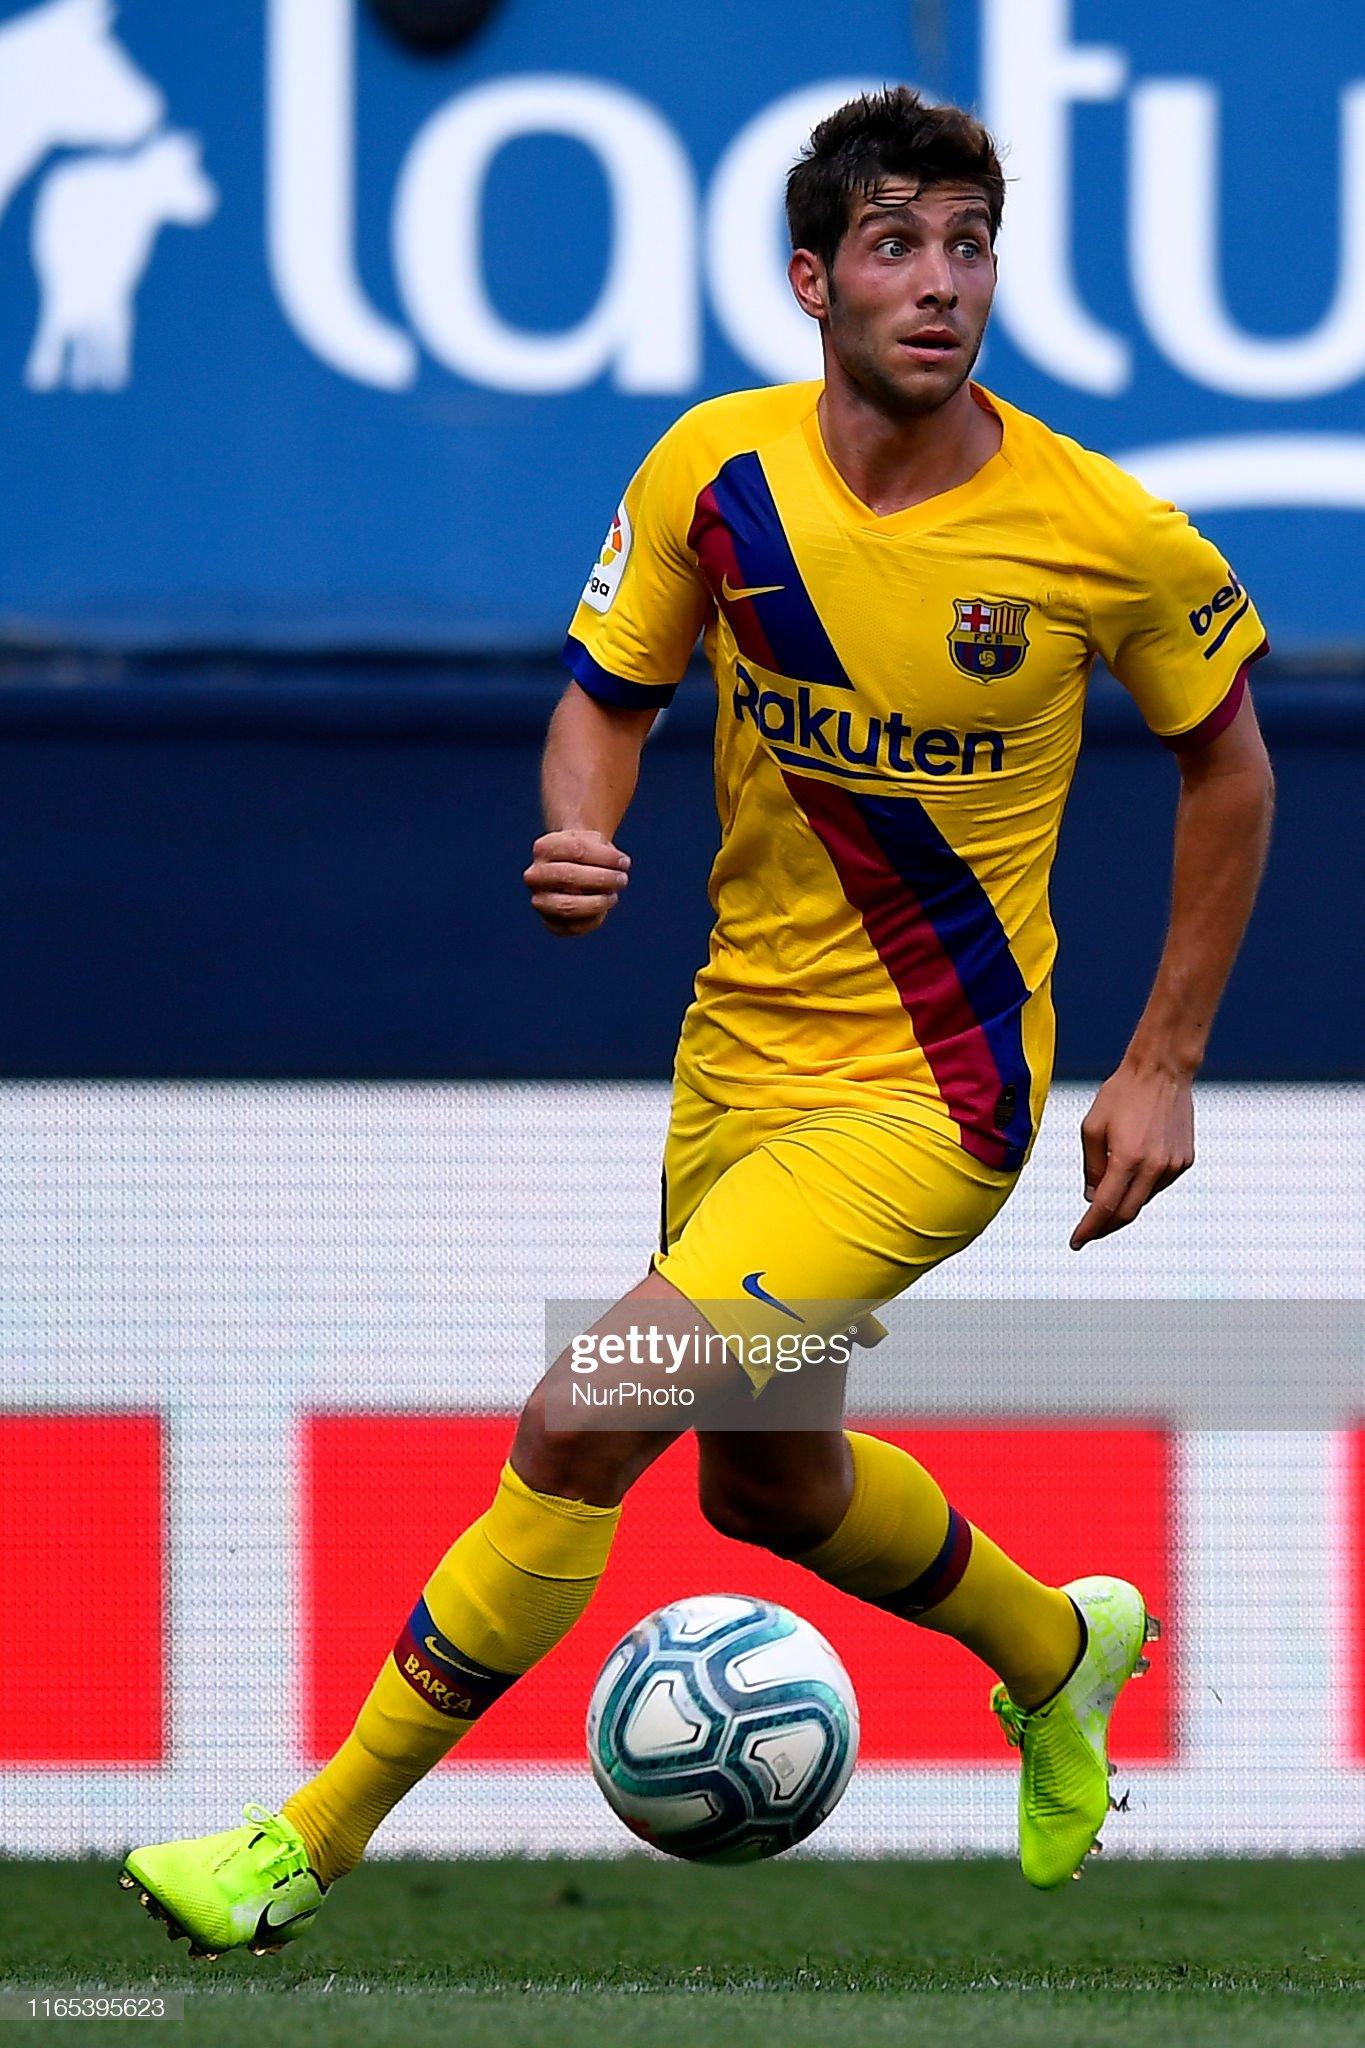 صور مباراة : أوساسونا - برشلونة 2-2 ( 31-08-2019 )  Sergi-roberto-of-barcelona-in-action-during-the-liga-match-between-ca-picture-id1165395623?s=2048x2048